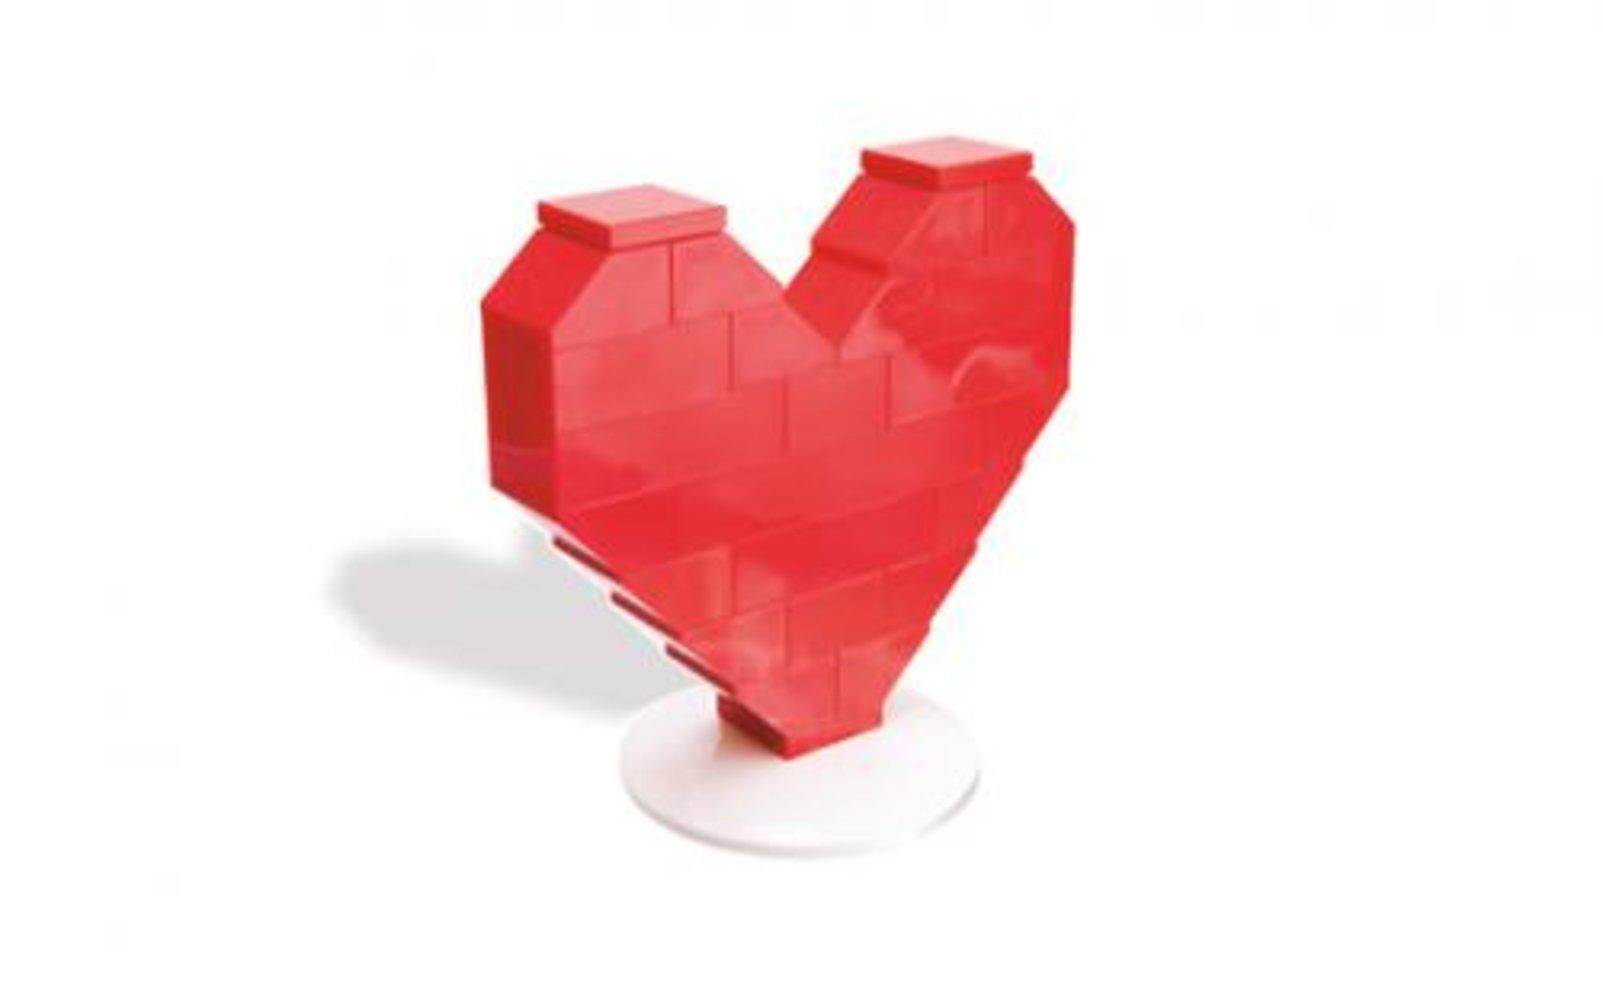 Heart 2010